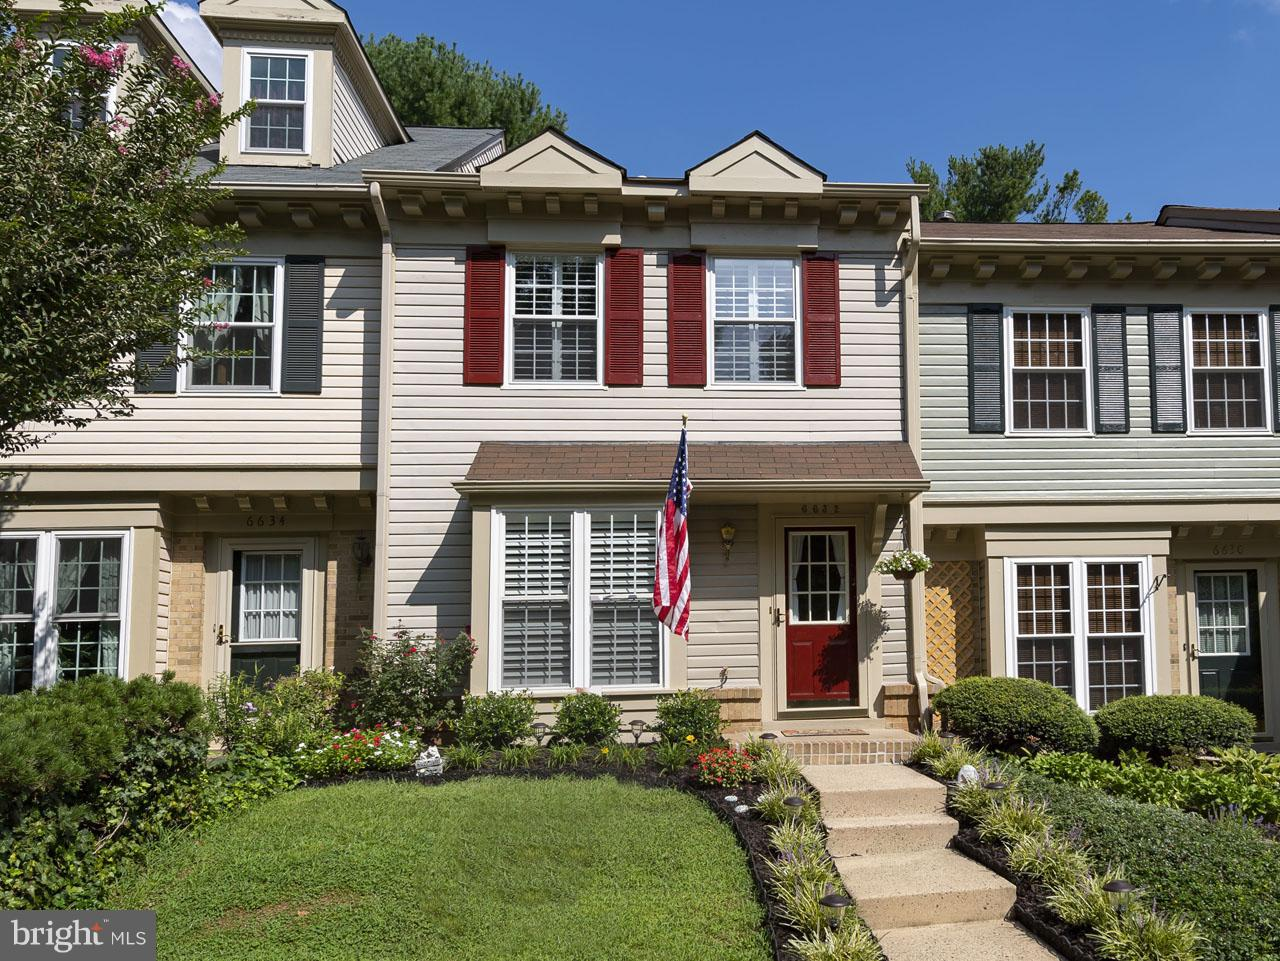 1002640508-300537944598-2021-07-22-05-00-37     Pinecrest   Alexandria Delaware Real Estate For Sale   MLS# 1002640508  - Best of Northern Virginia